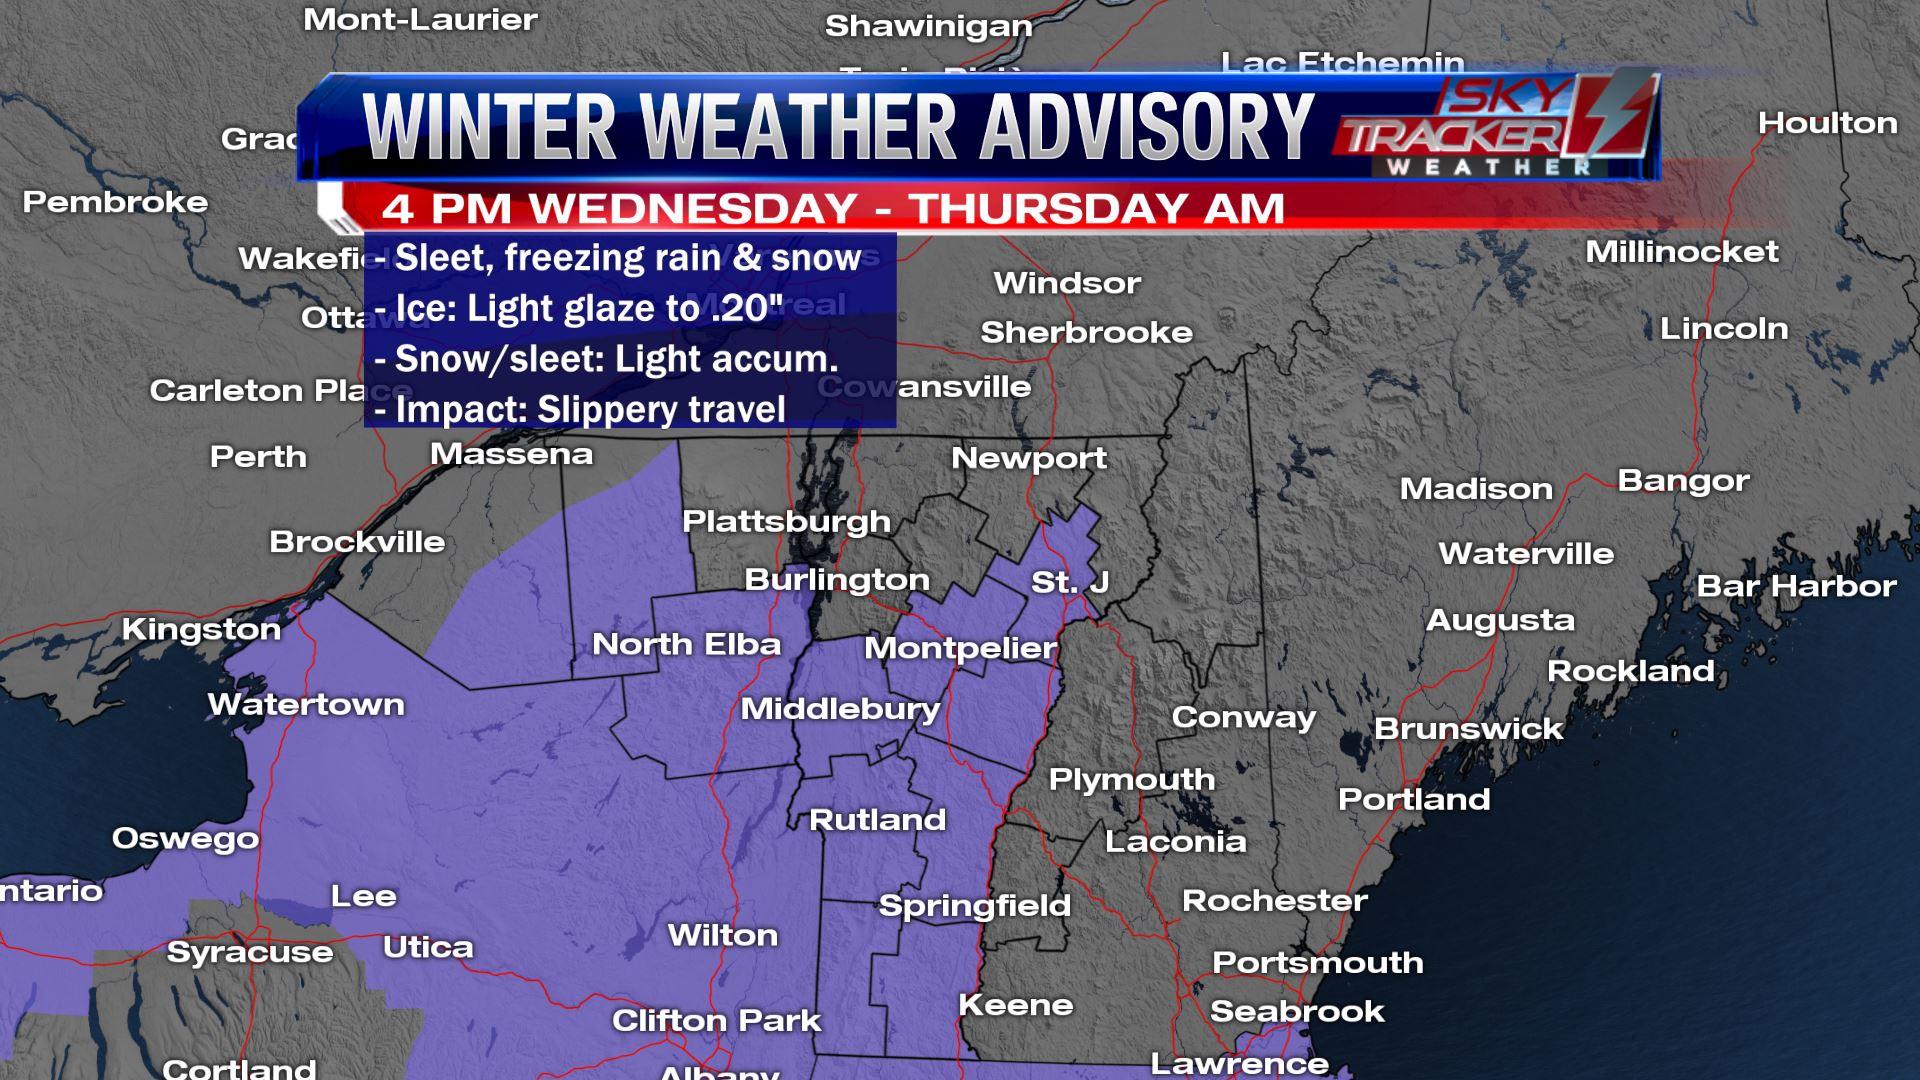 Winter Weather Advisory Feb 6 2019